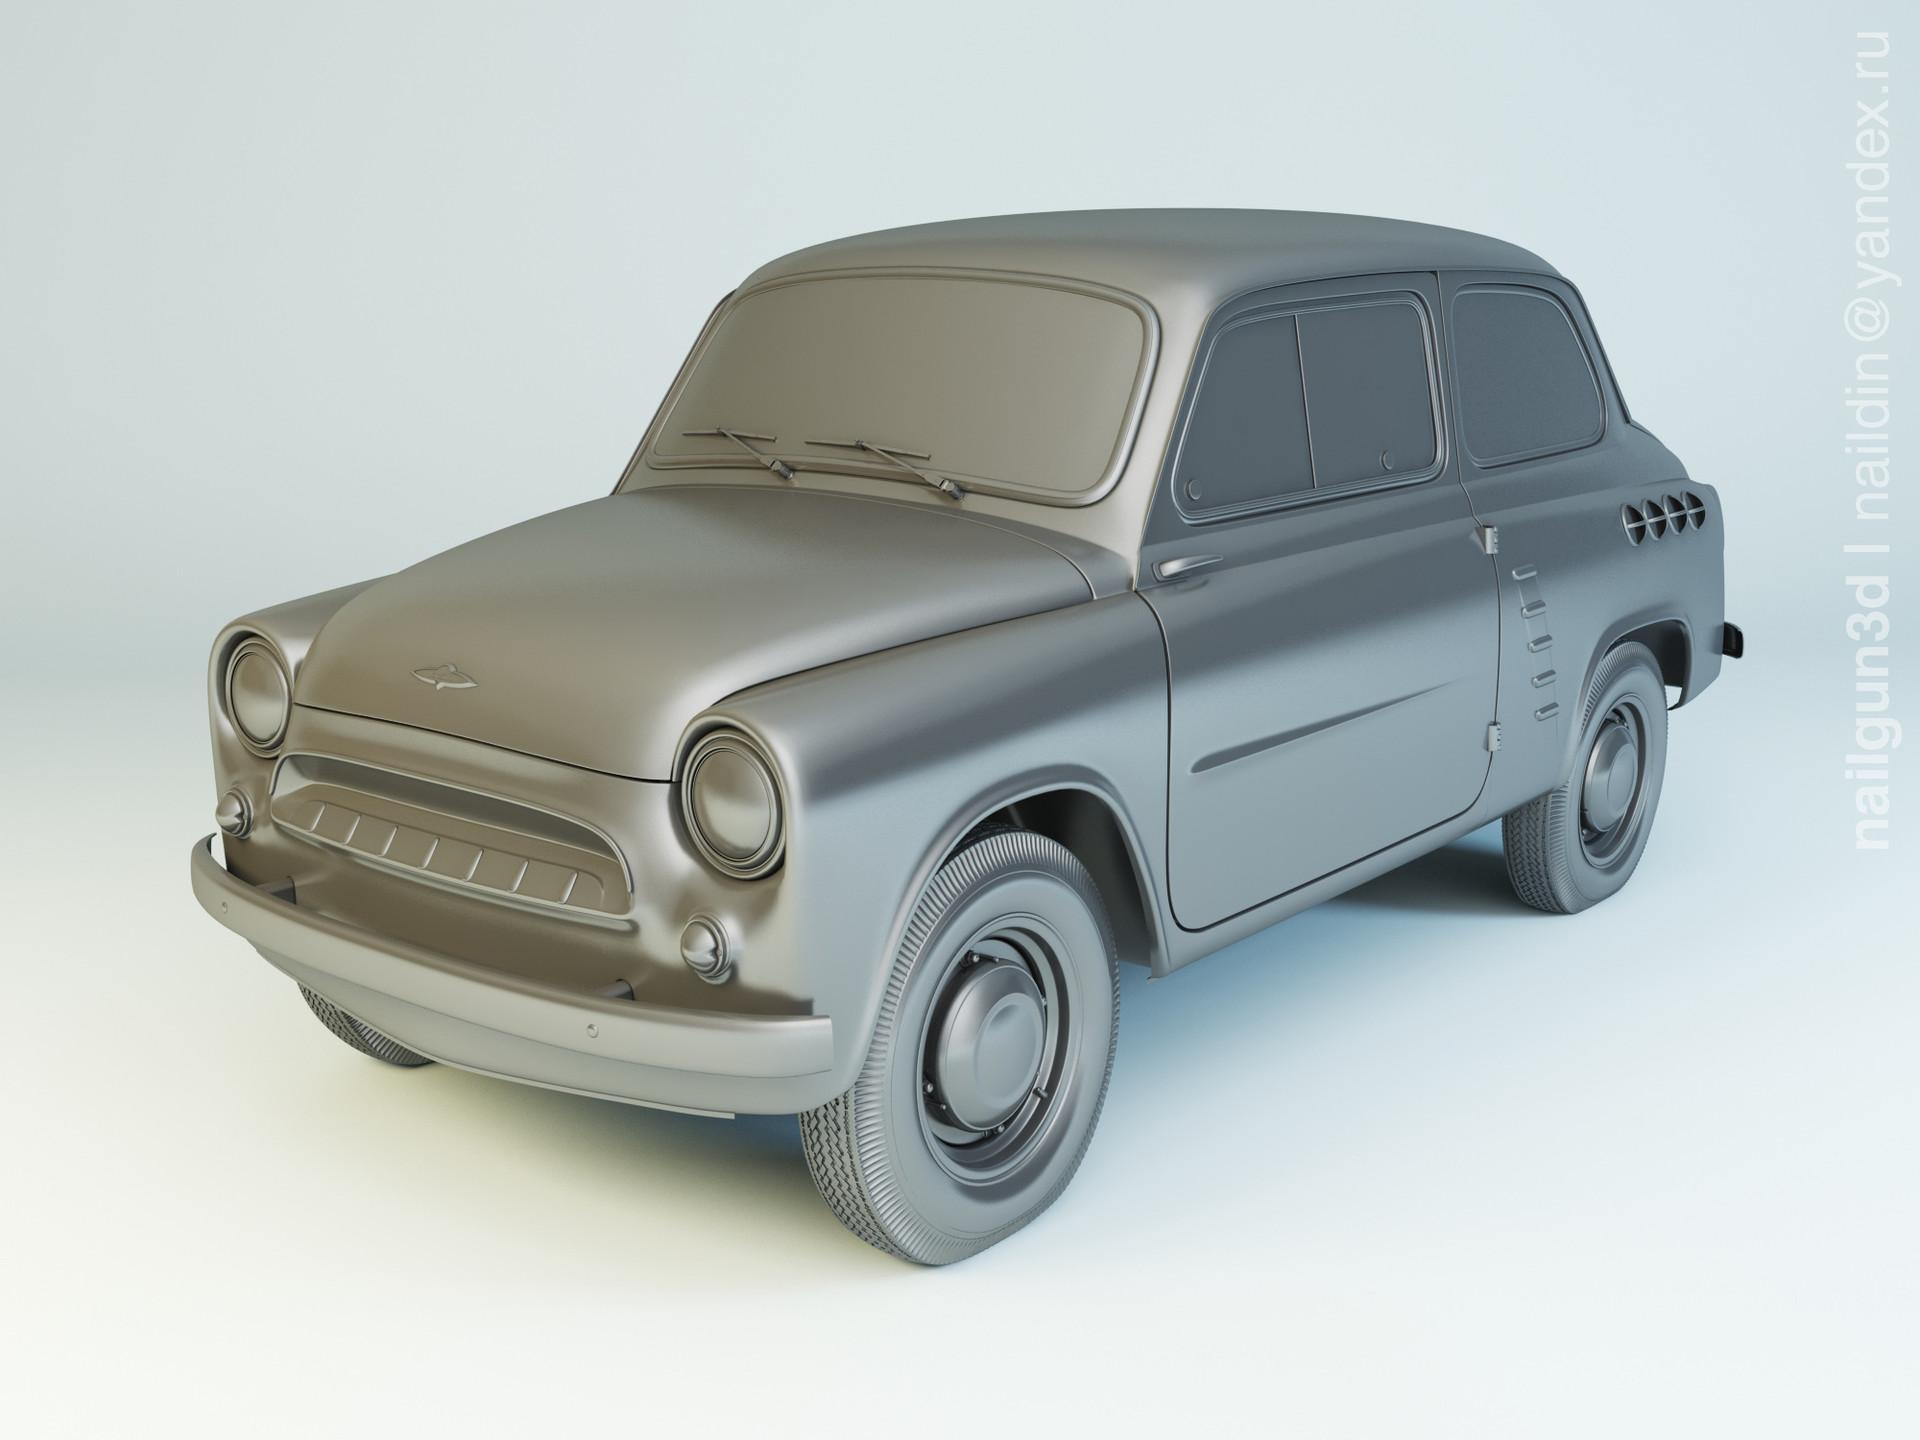 Nail khusnutdinov als 235 002 mzma moskvich 444 modellling 0